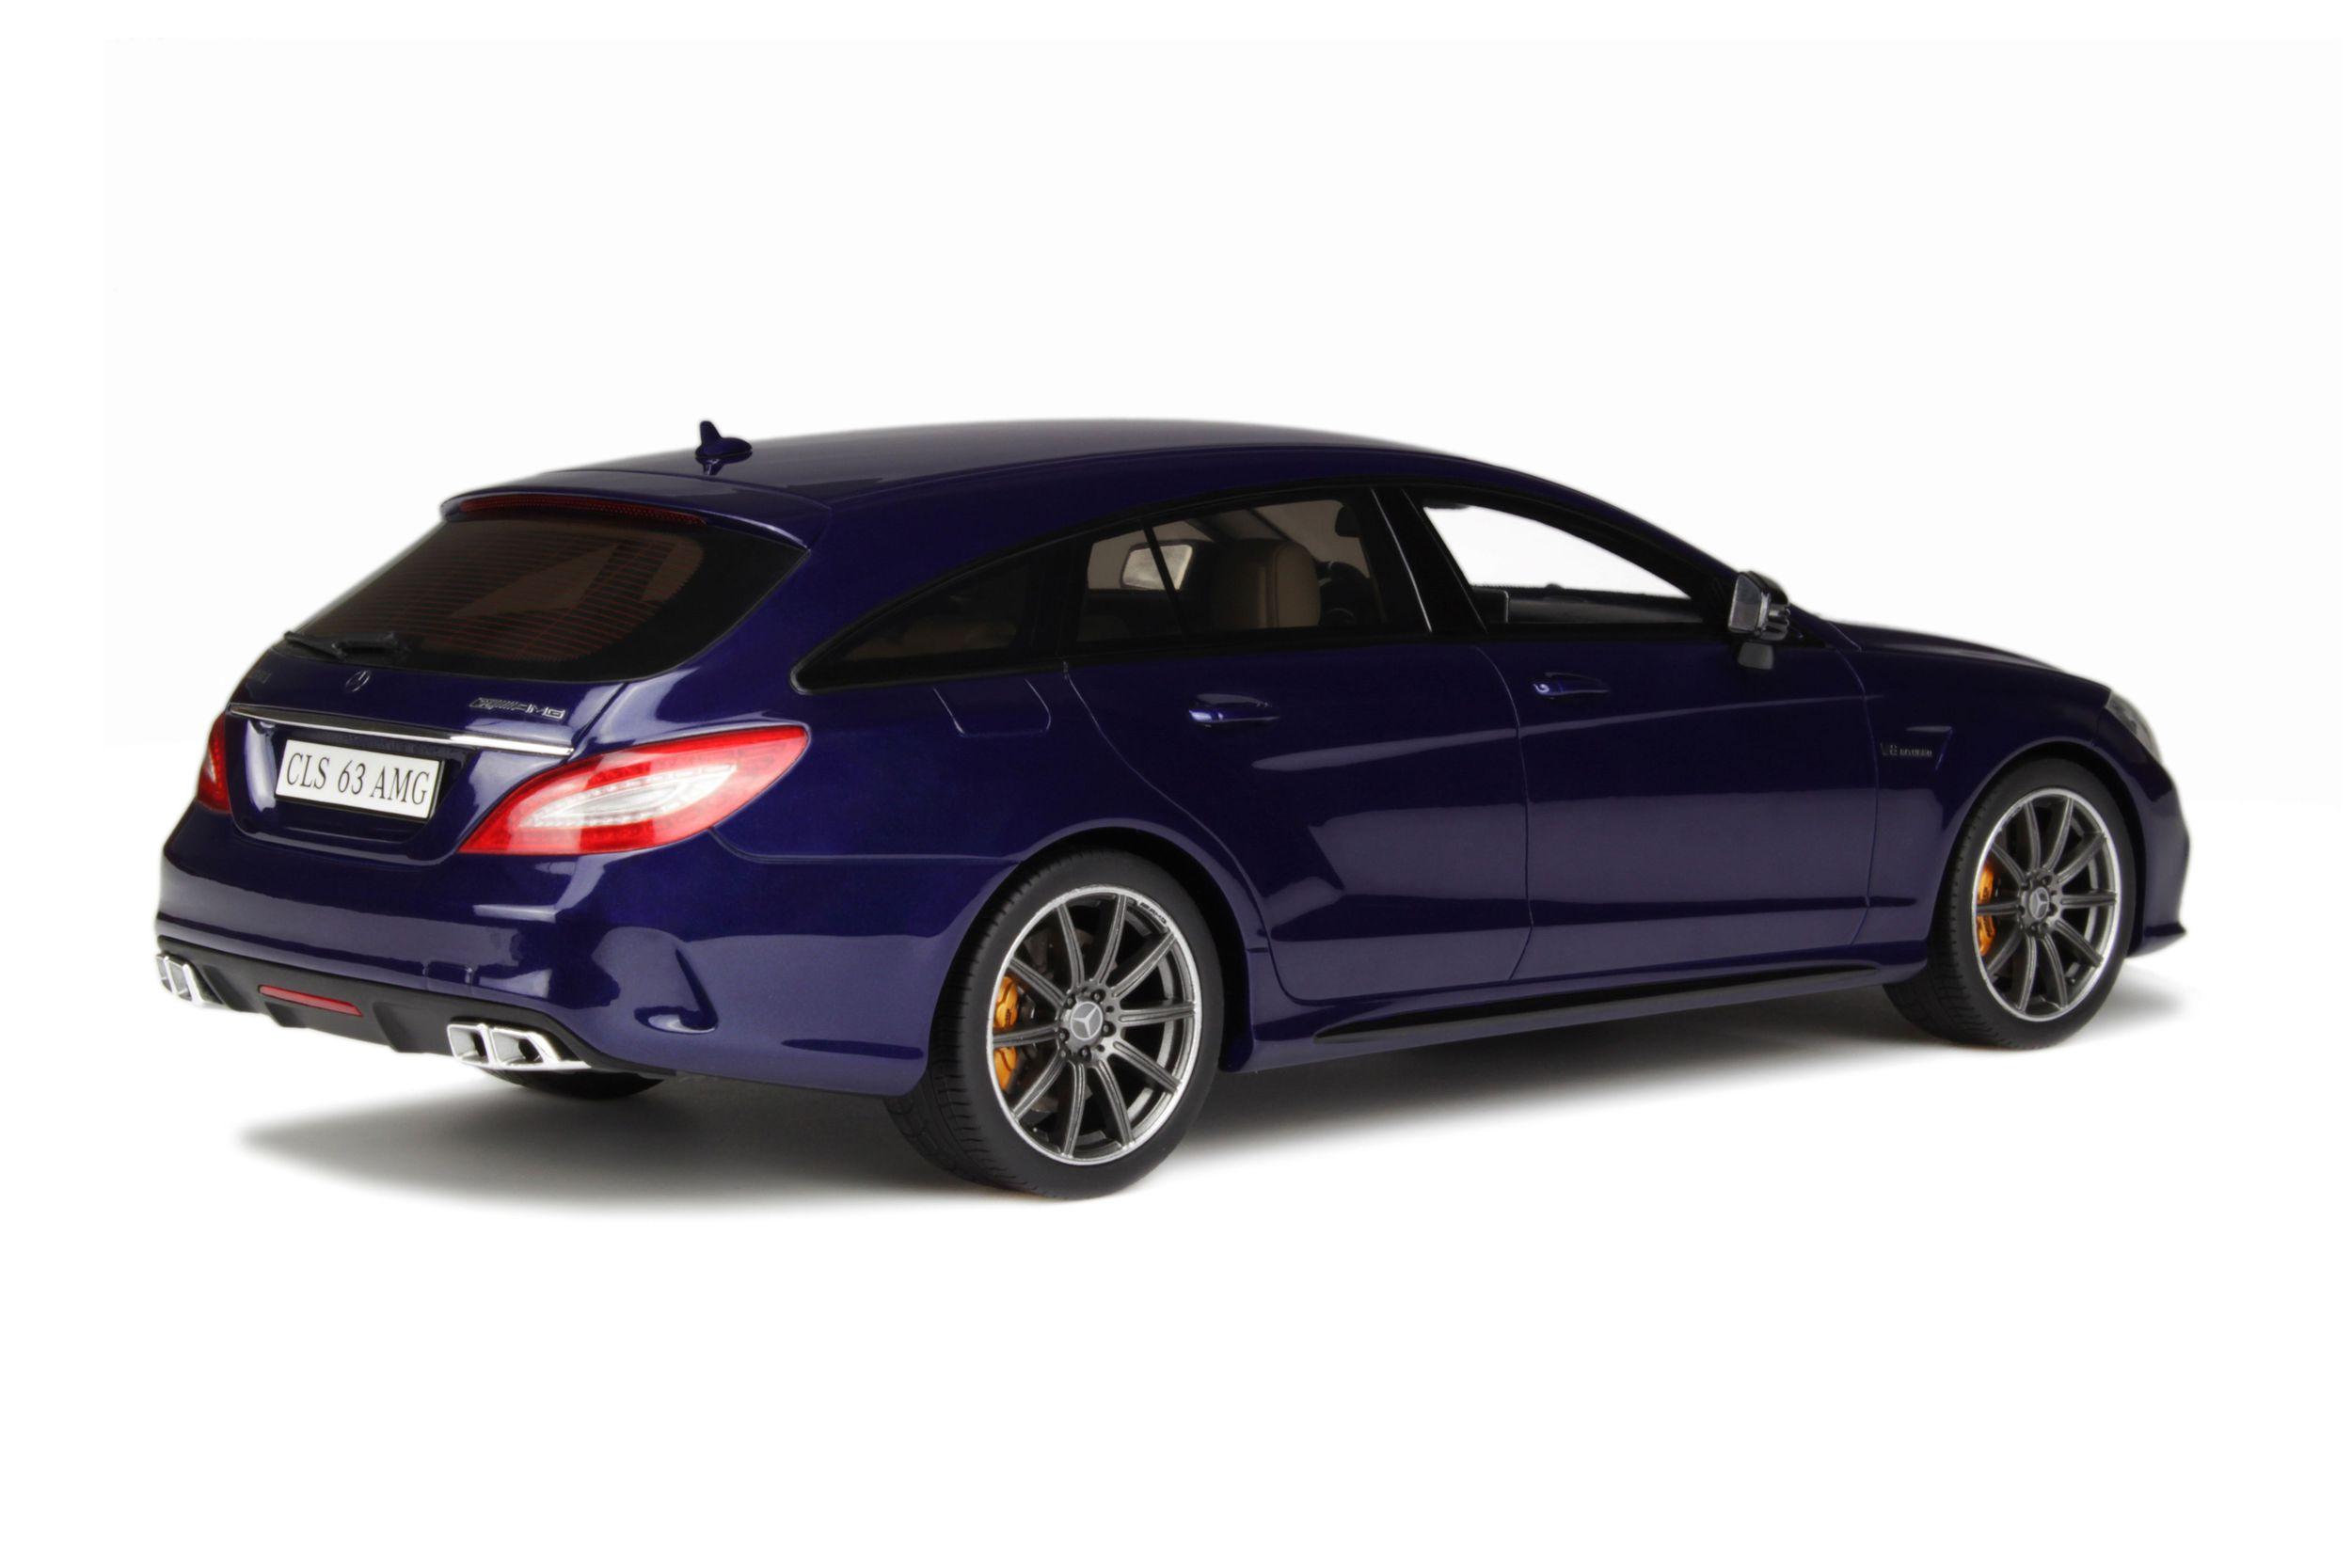 mercedes-benz cls 63 amg shooting brake - model car collection | gt